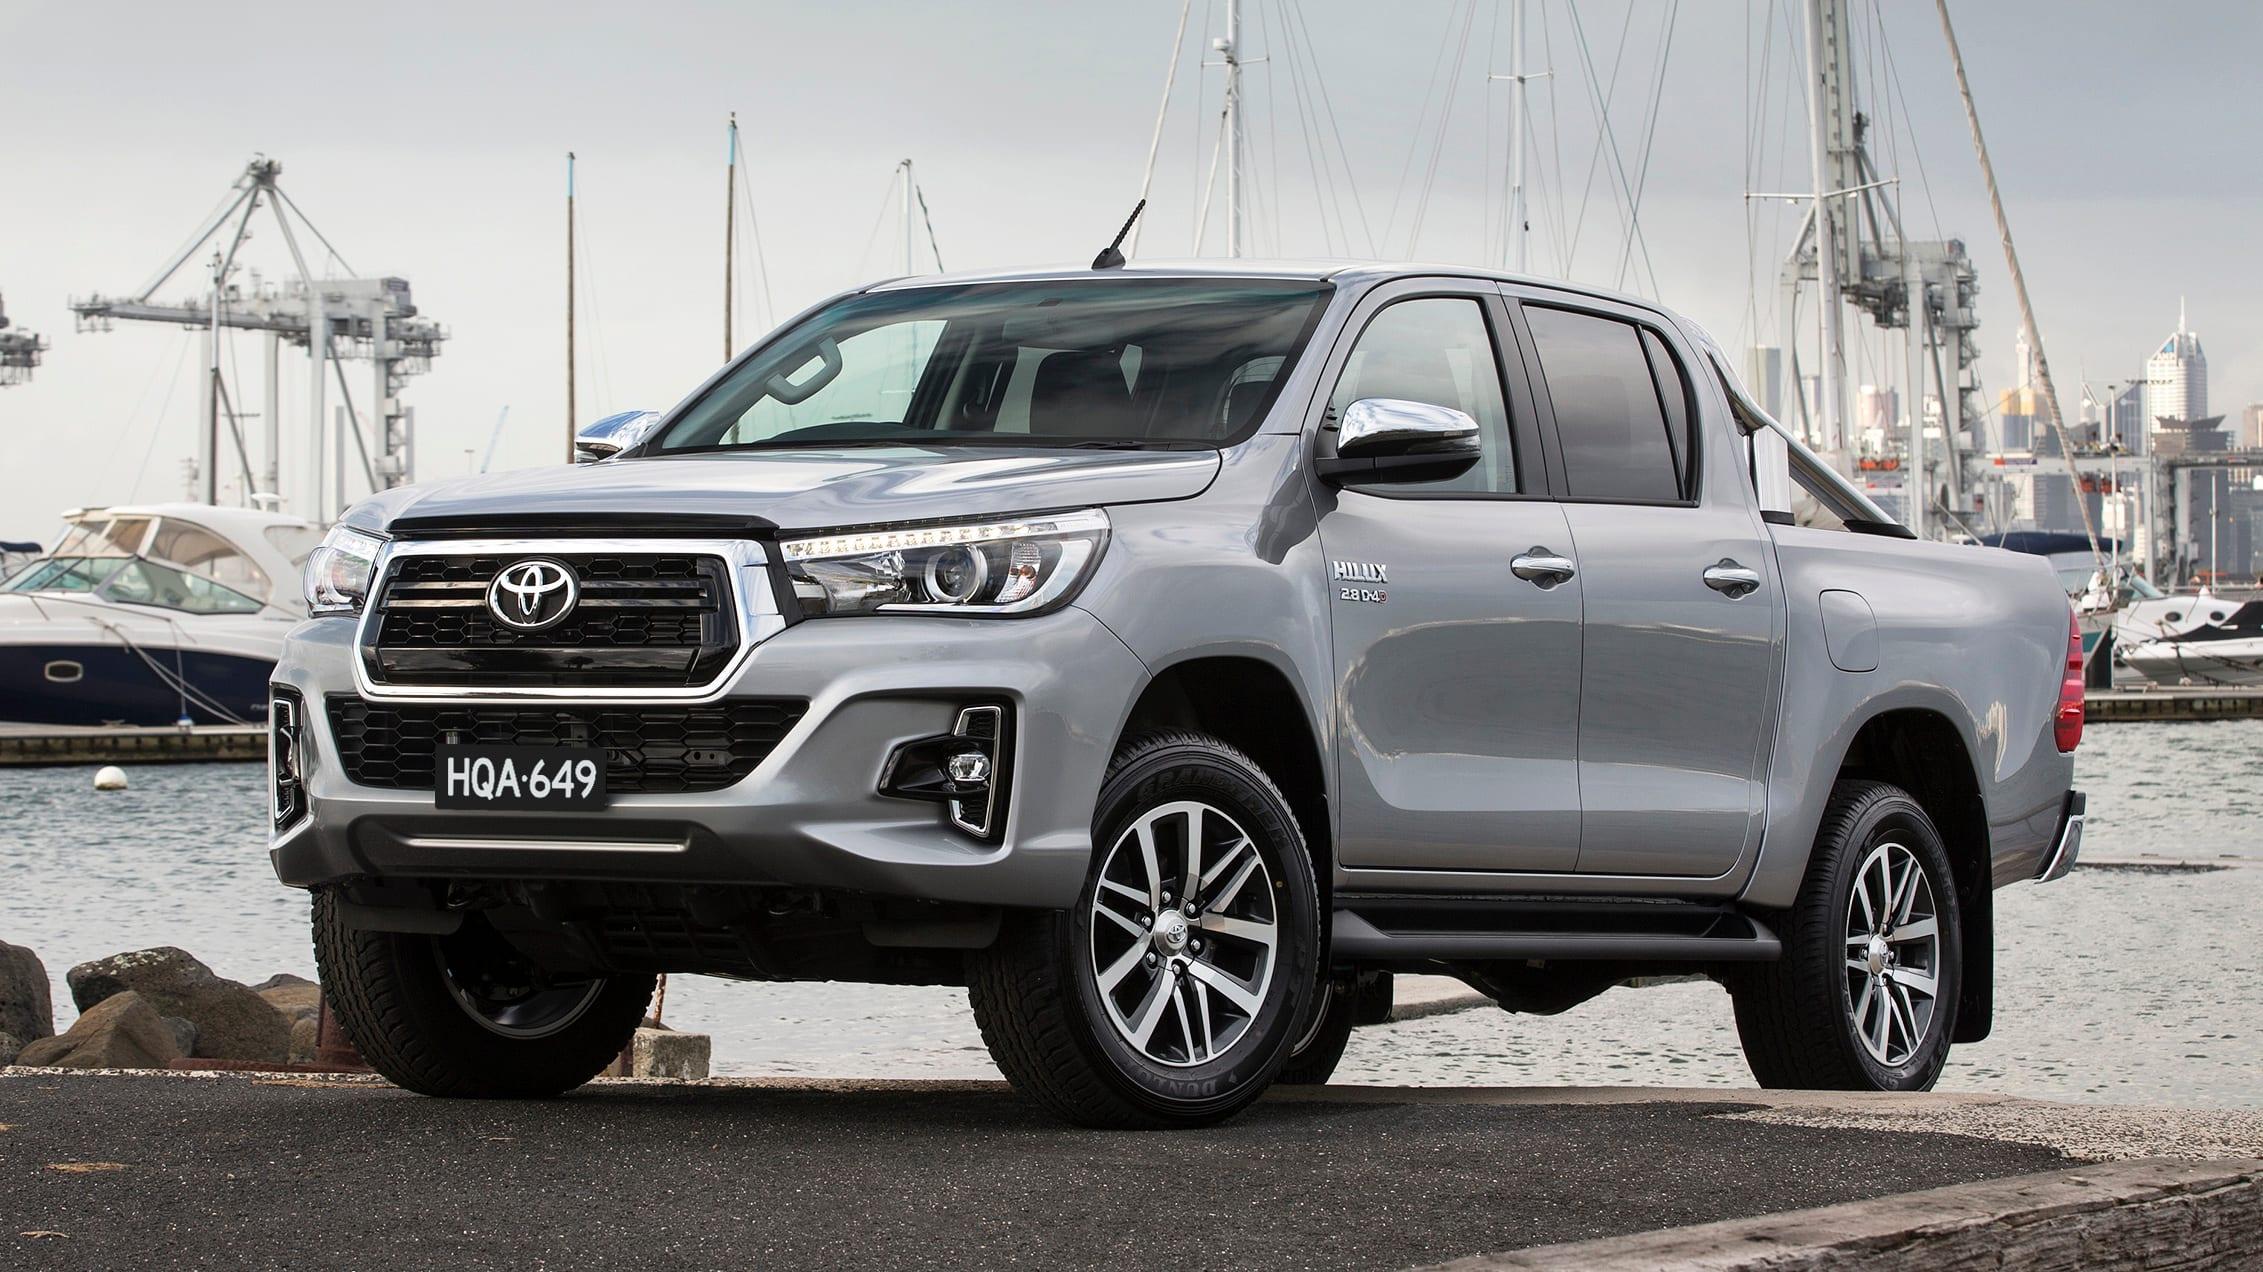 Kekurangan Toyota Hilux 2019 Harga